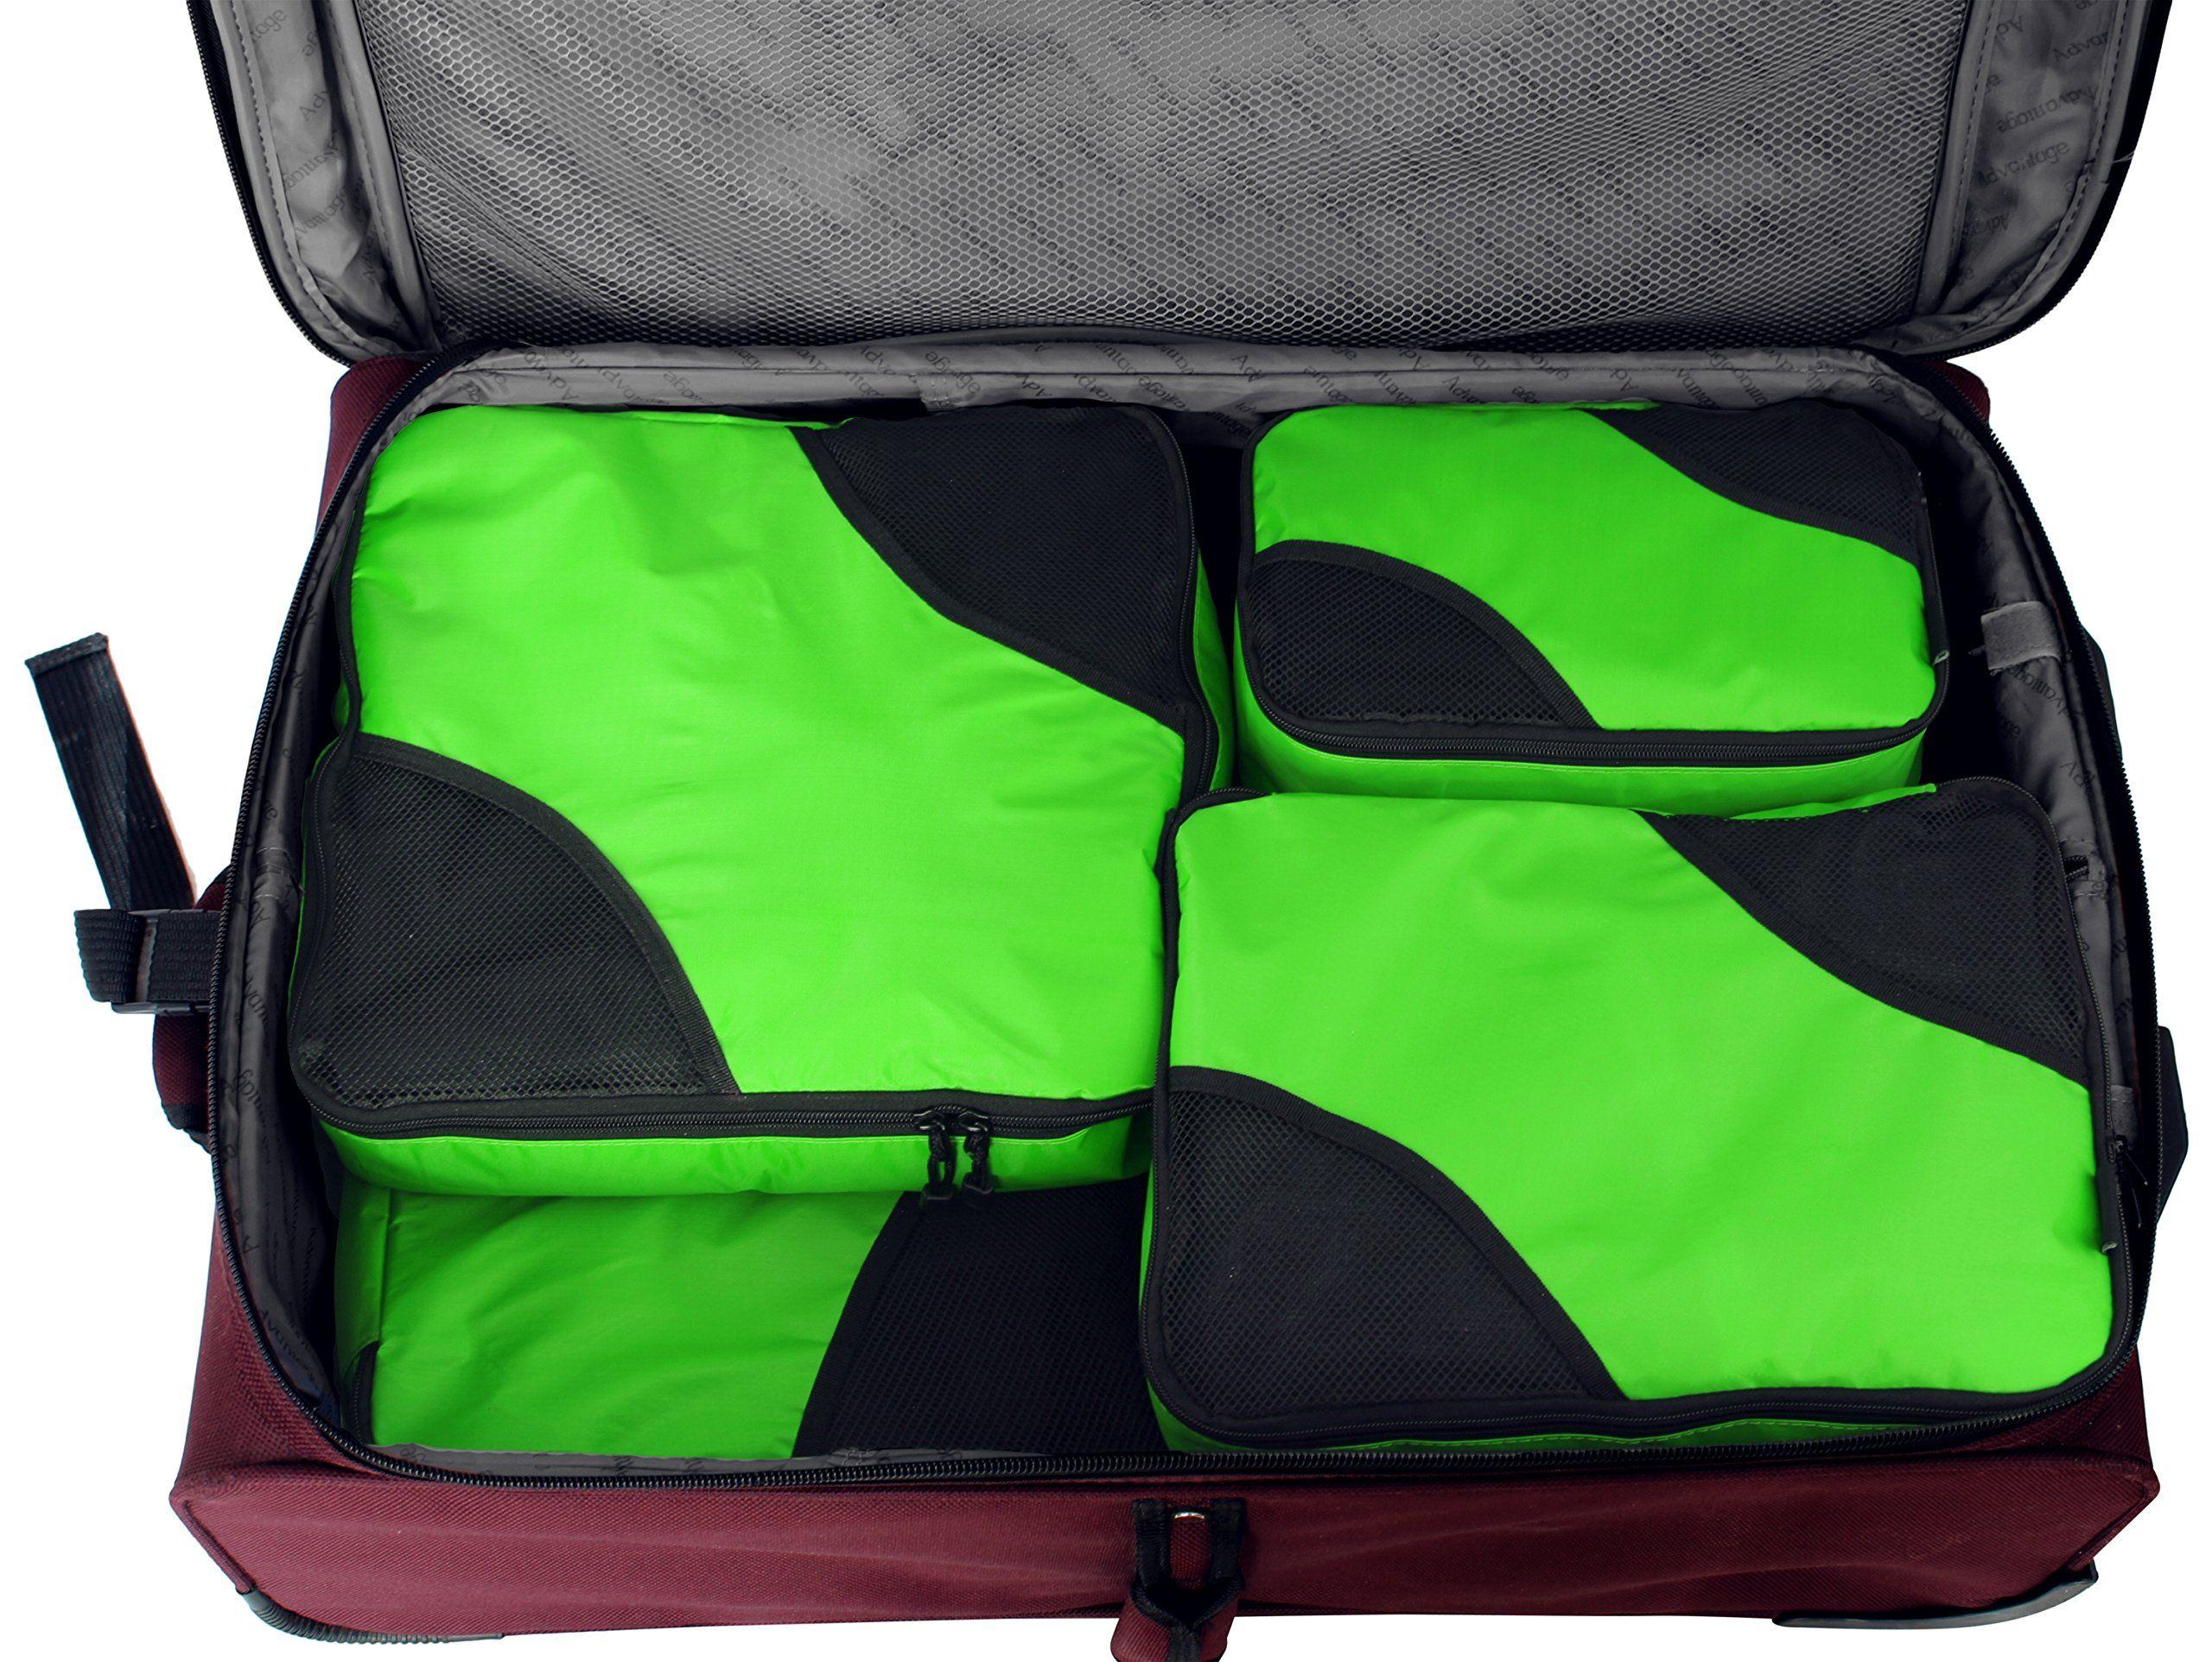 6 pcs set 5 packing cubes plus shoe baglaundry bag travel 6 pcs set 5 packing cubes plus shoe baglaundry bag travel solutioingenieria Choice Image